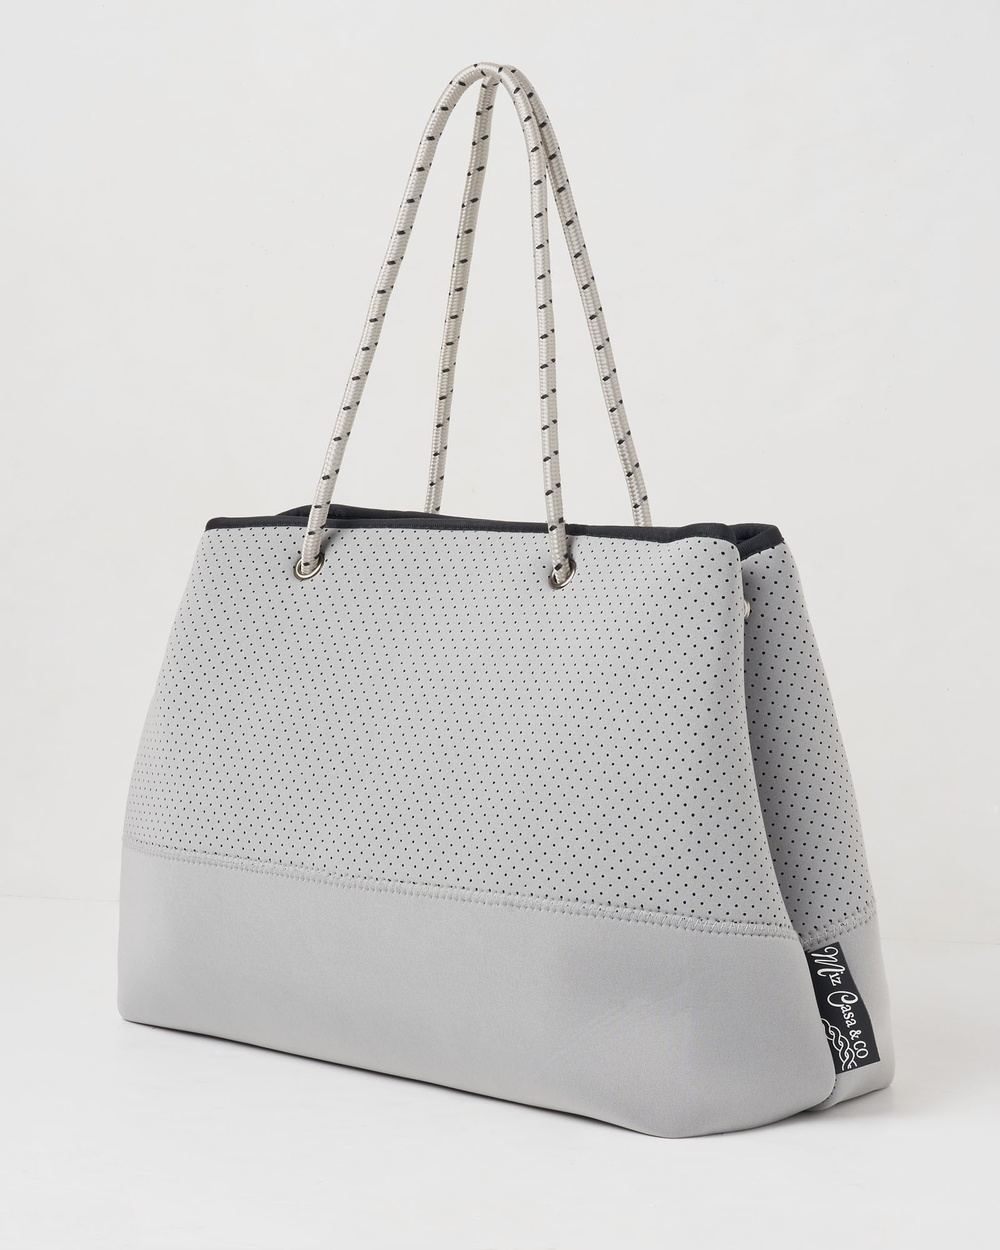 Miz Casa and Co Ivy Neoprene Tote Bag Bags Grey